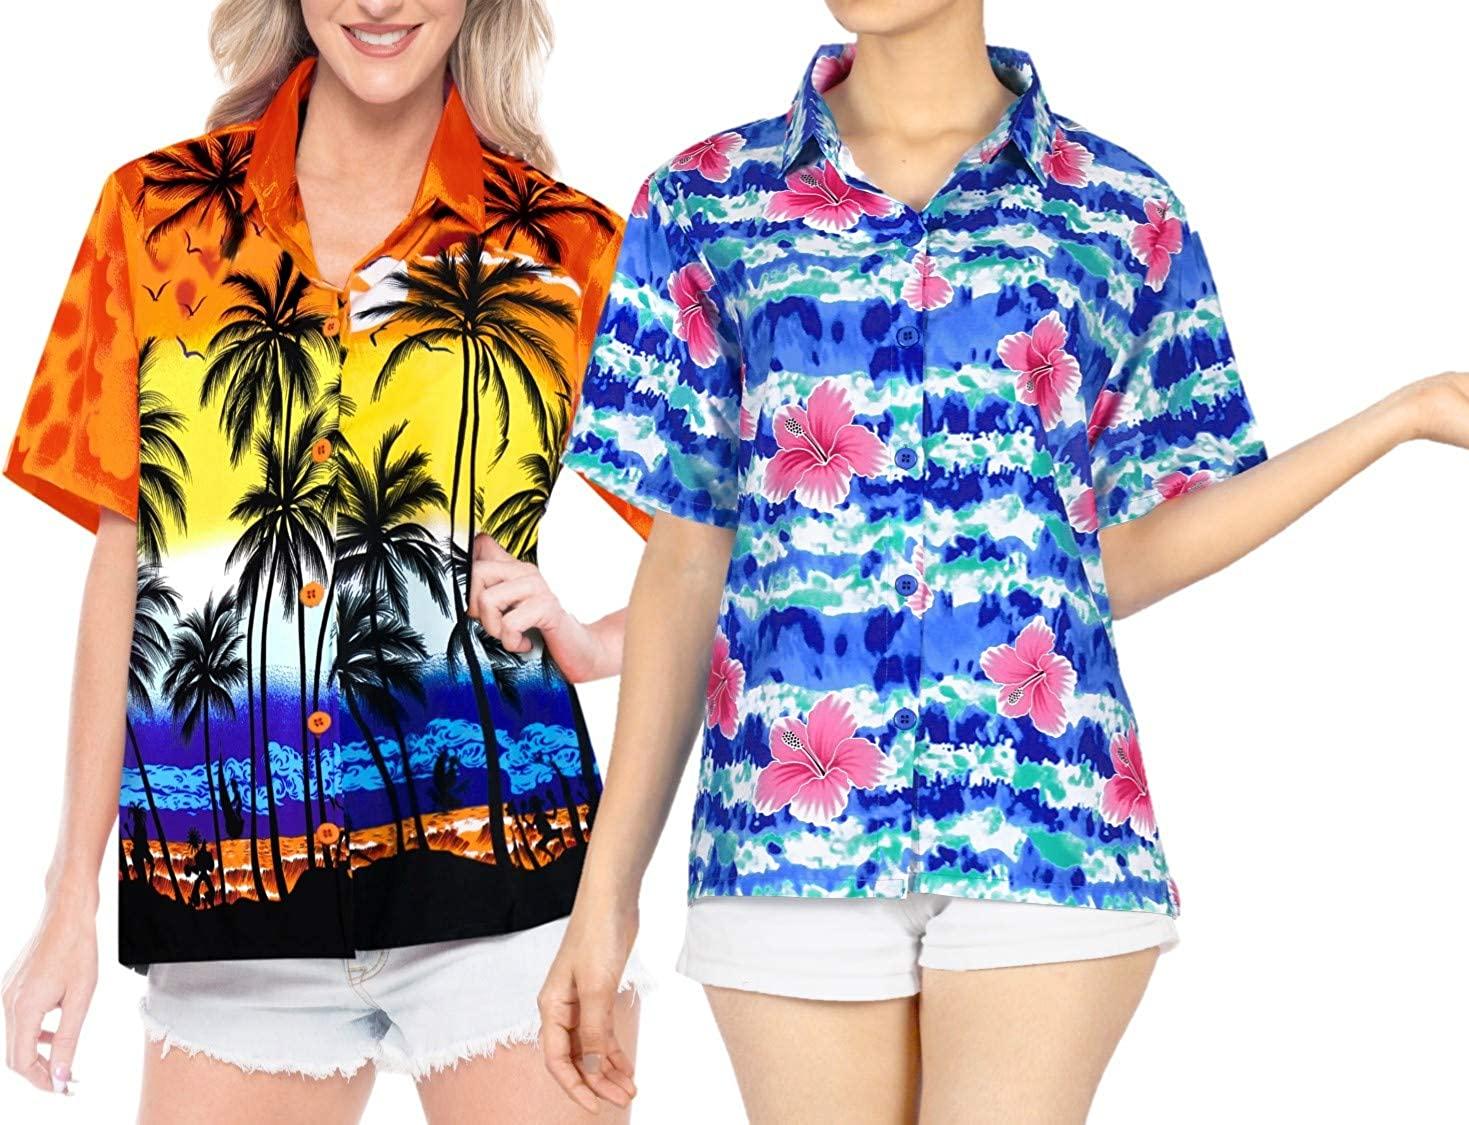 LA LEELA Women's Tunic Hawaiian Shirt Beach Aloha Party Camp Shirt Work from Home Clothes Women Beach Shirt Blouse Shirt Combo Pack of 2 Size M